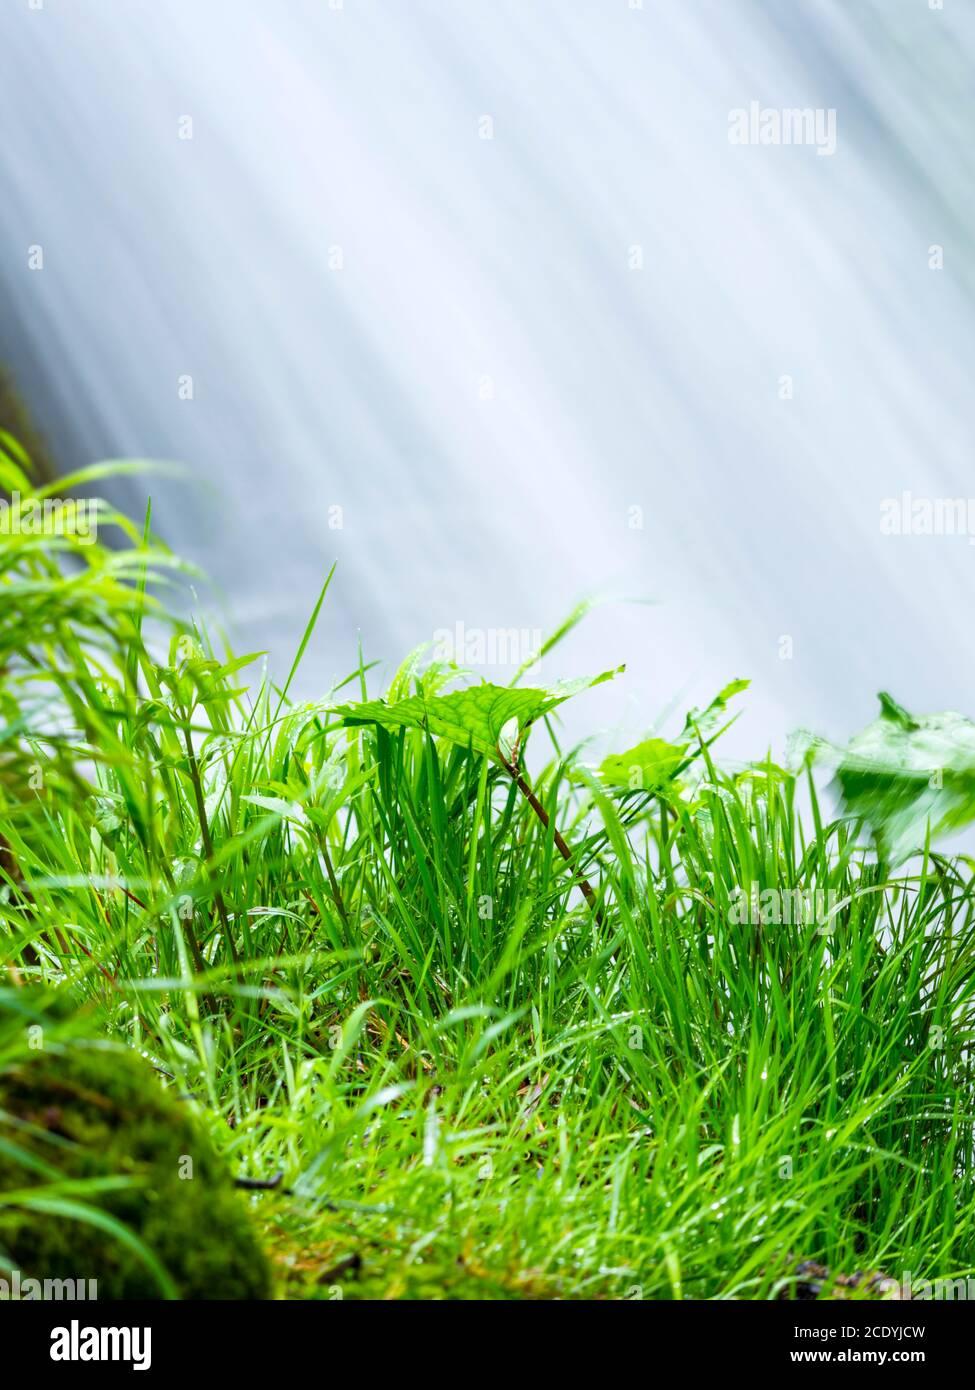 Parque nacional Lagos de Plitvice en Croacia Europa flujo de agua cascada escénico paisaje hierba cerca caída río detalle aislado Foto de stock